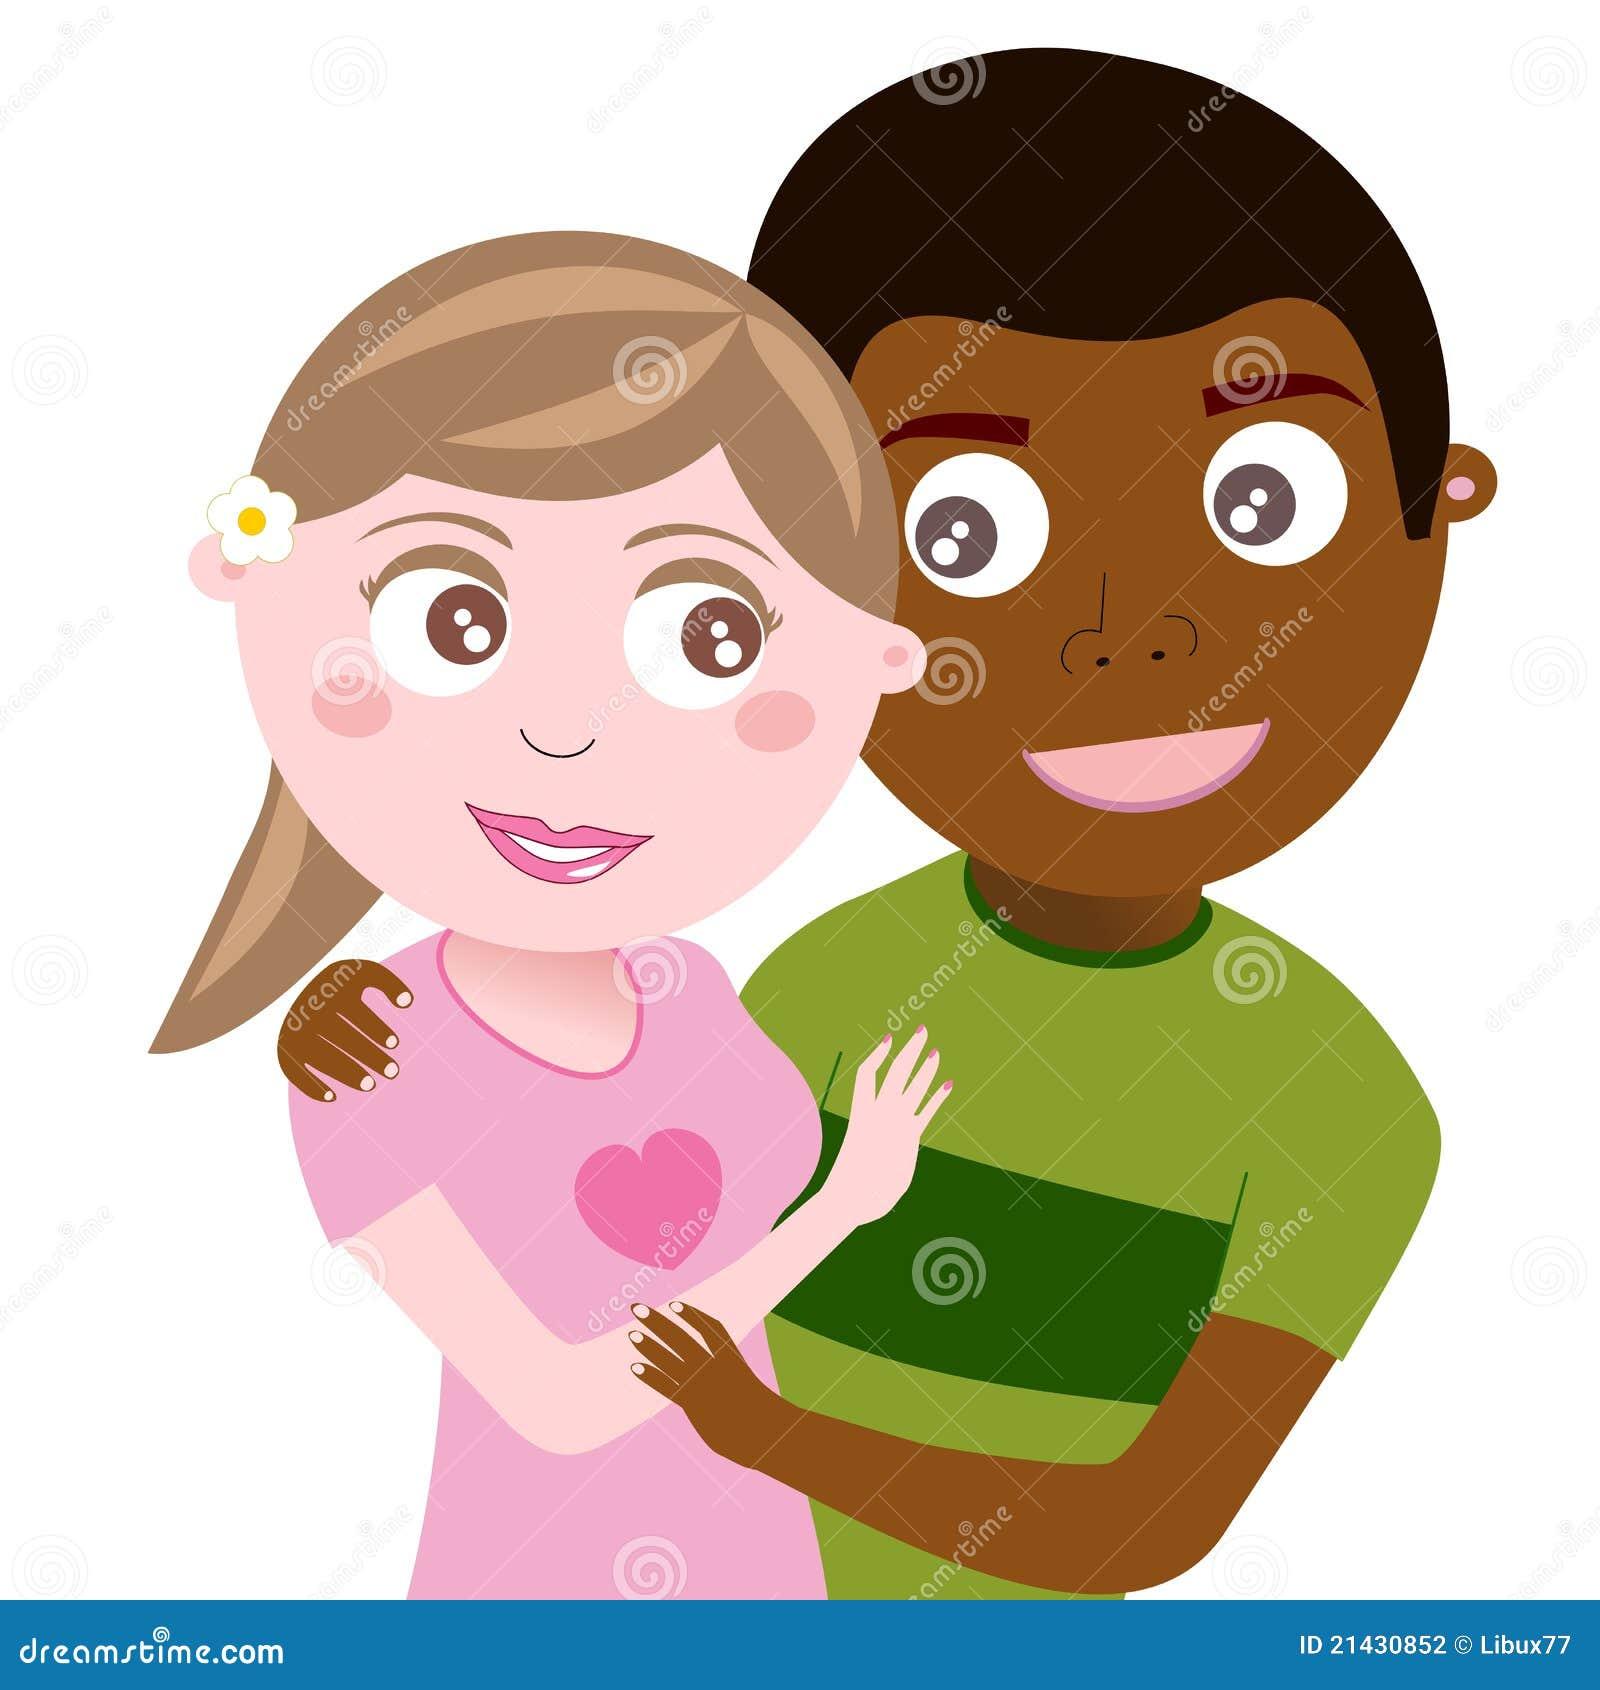 Interracial dating Emoji